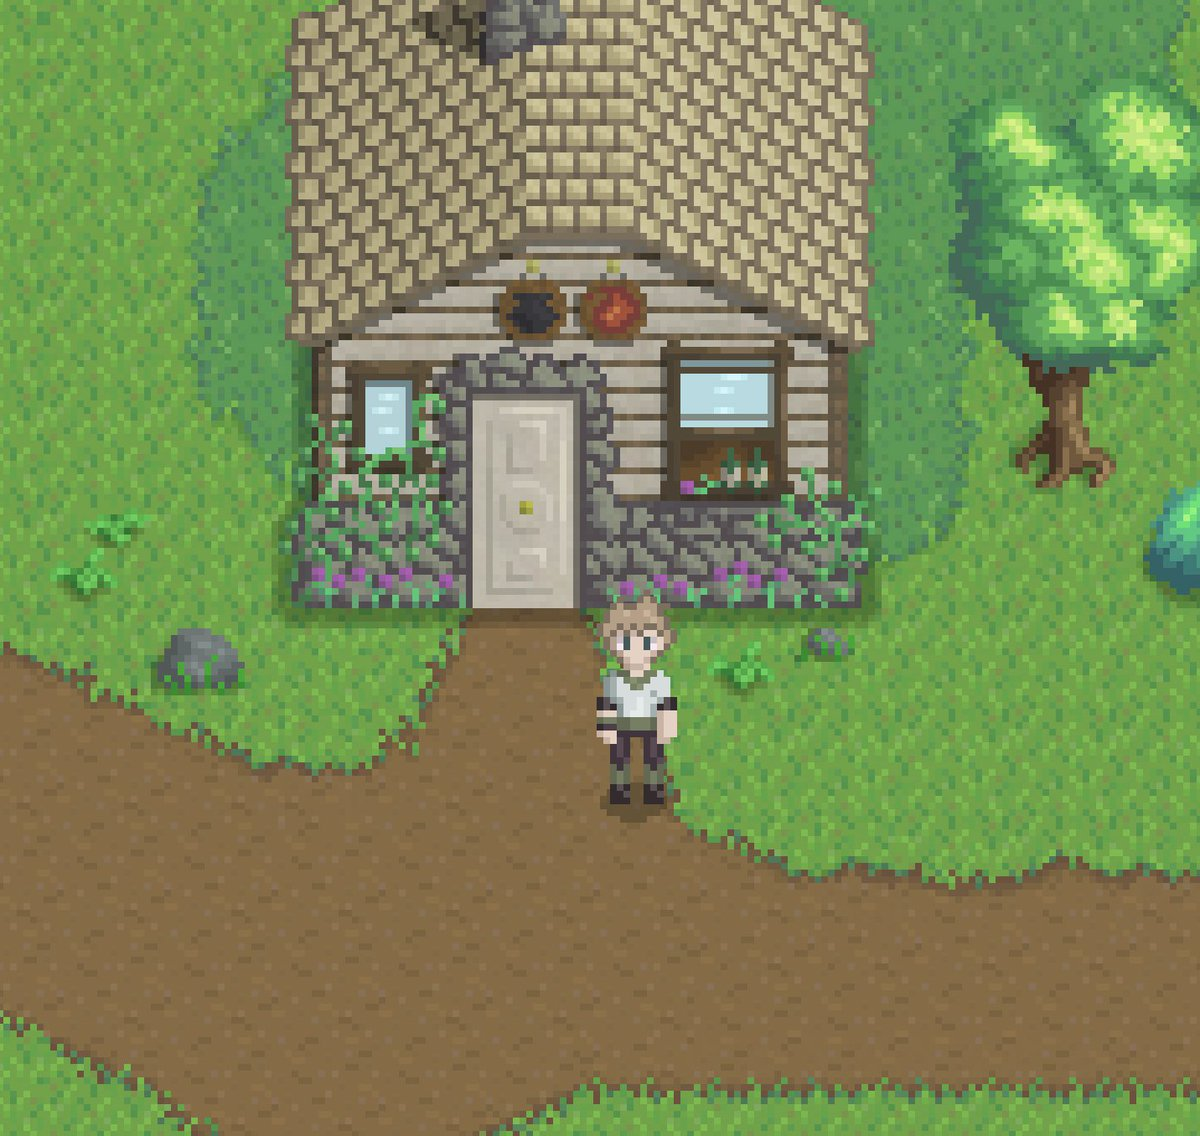 Screenshot from Croix Island in Revery Rebirth. WIP. #gamedev #indiegame #pixelart #RPG<br>http://pic.twitter.com/zvnddkDin8